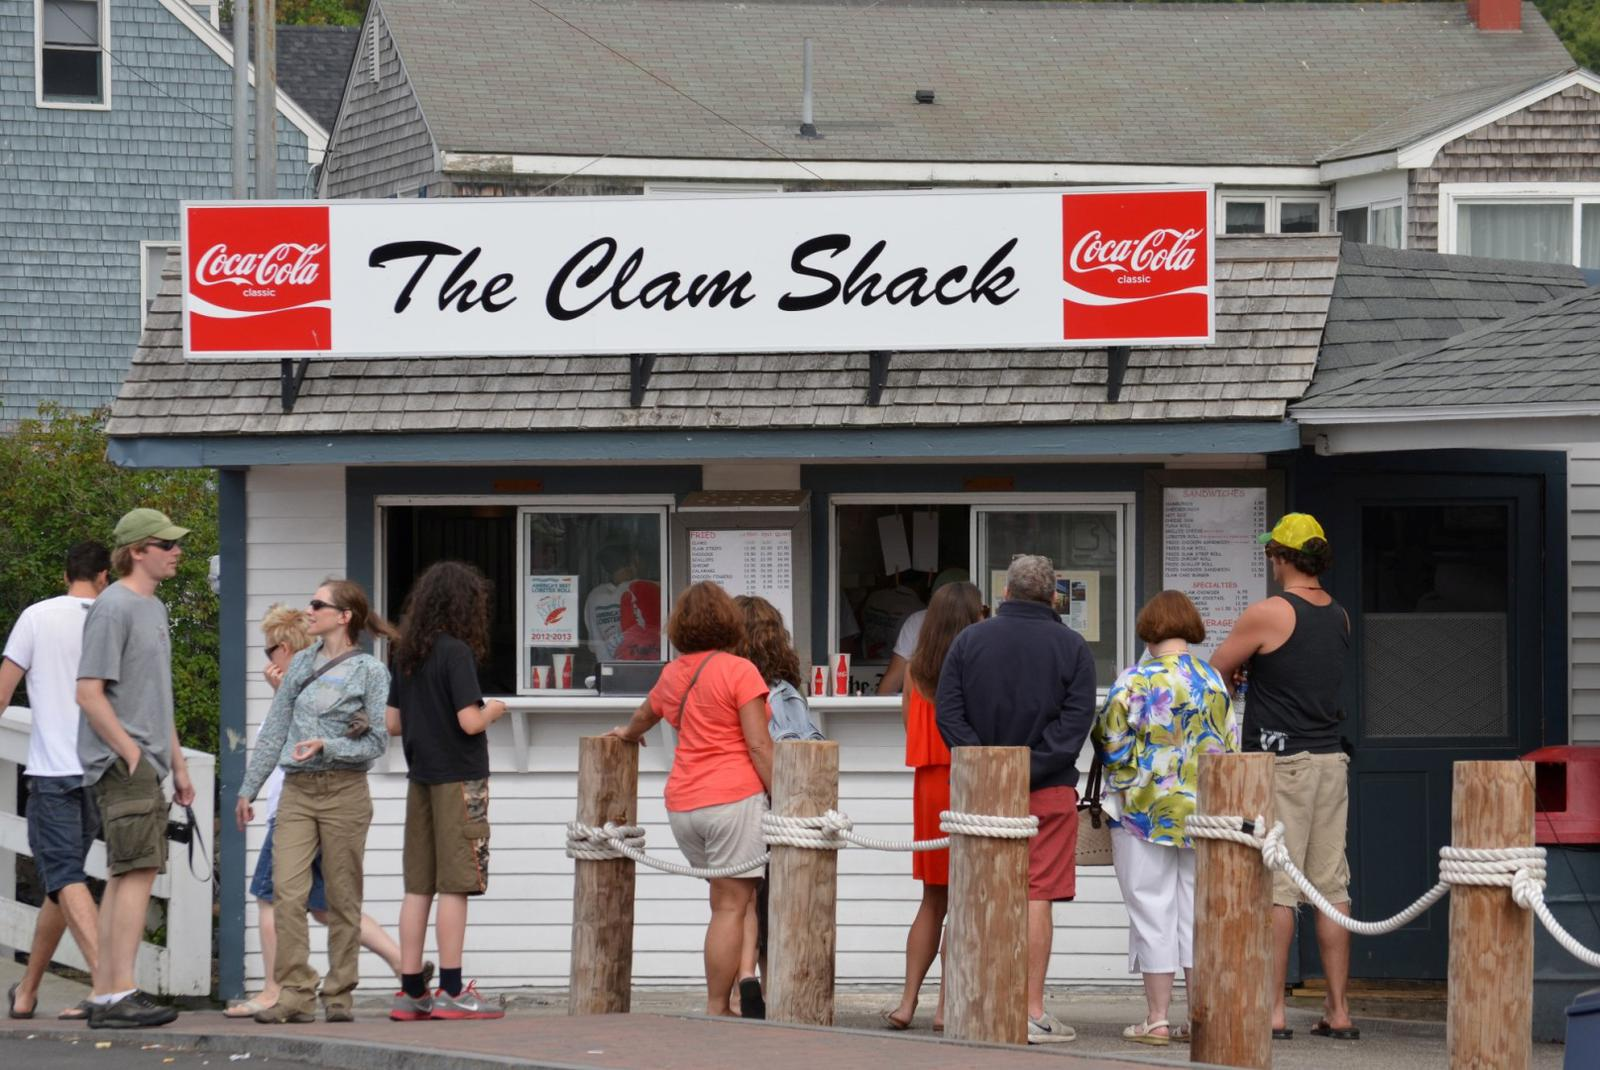 The Clam Shack, courtesy The Clam Shack